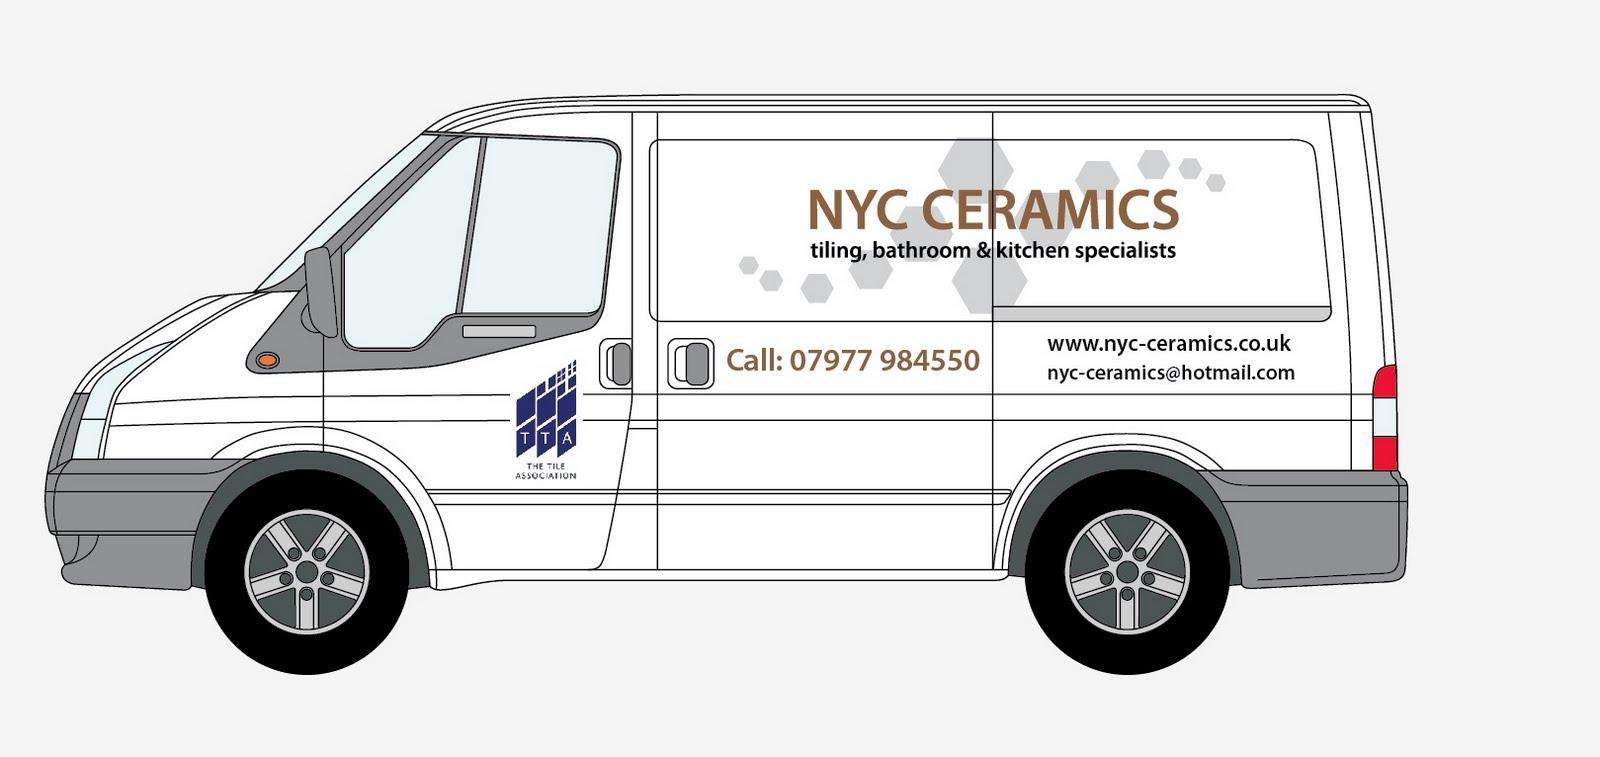 Nyc Ceramics: Sign writing for Nyc Ceramics new van?